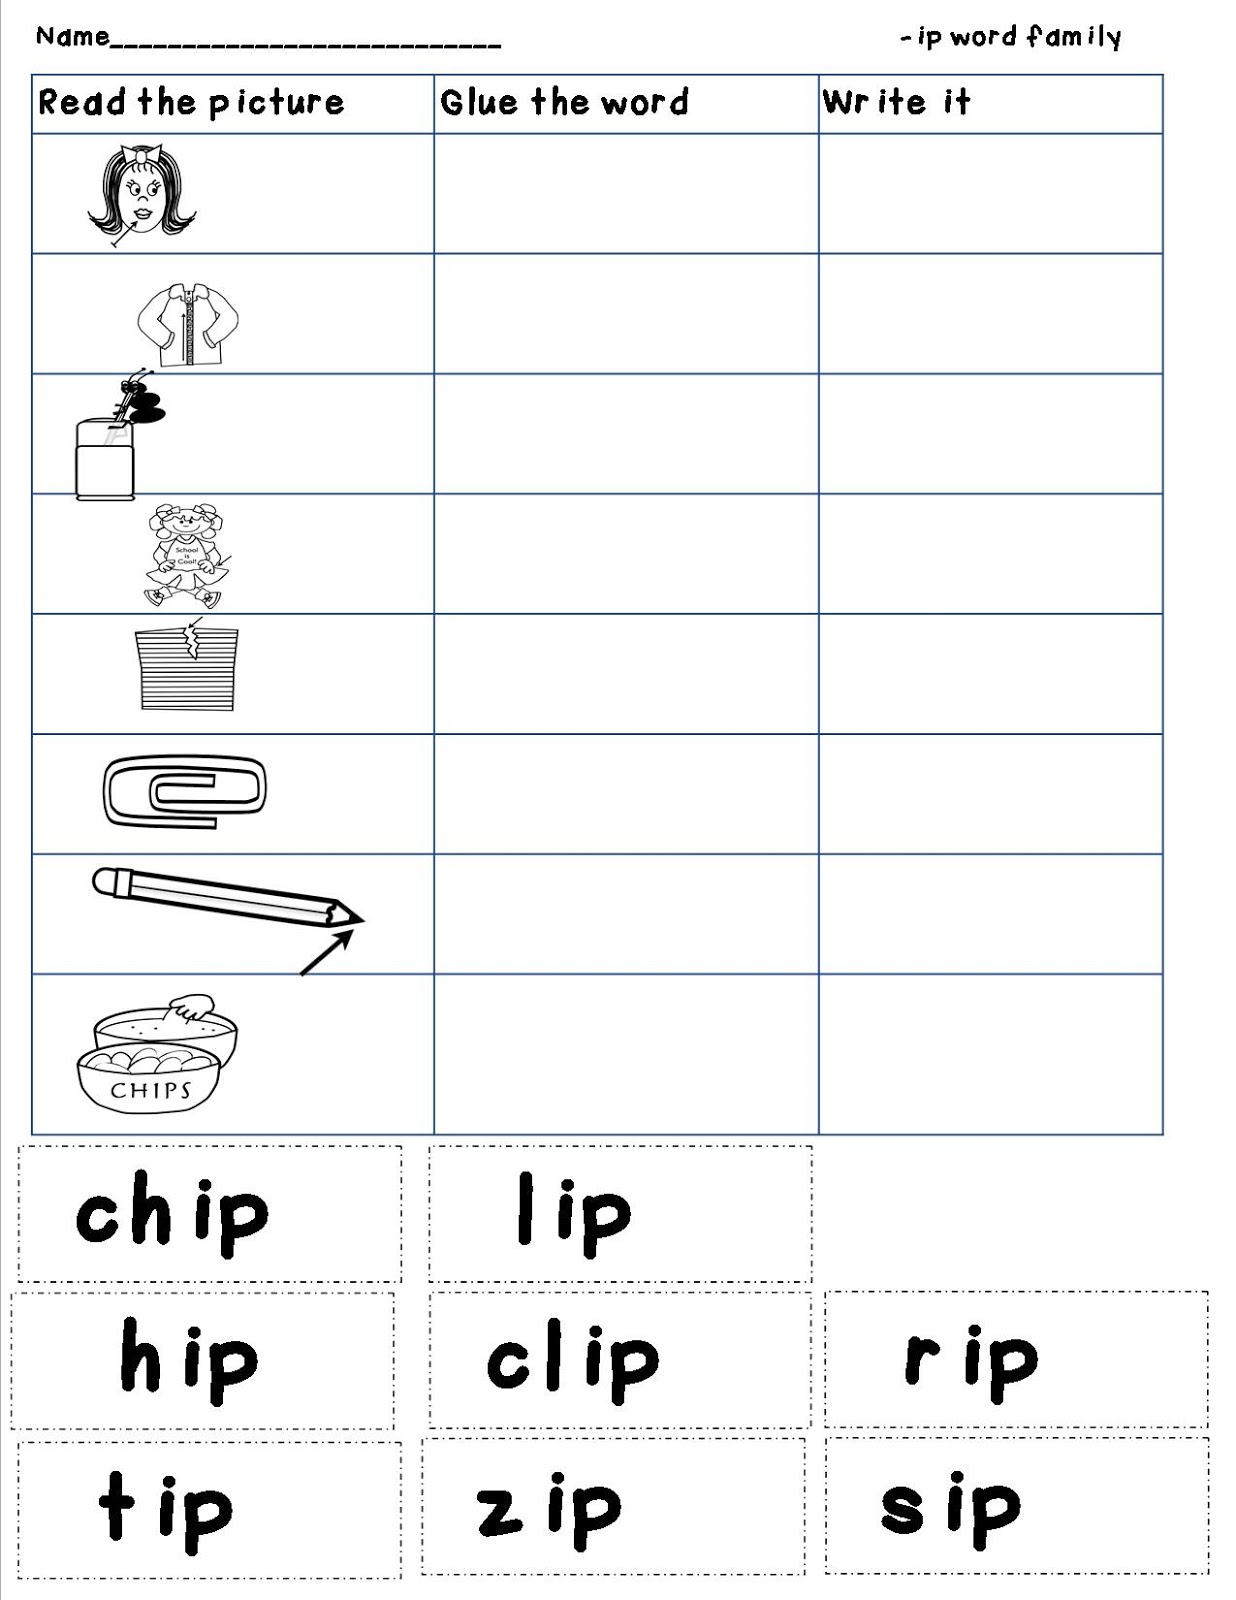 - Mrs. Bohaty's Kindergarten Kingdom: -ip Word Family